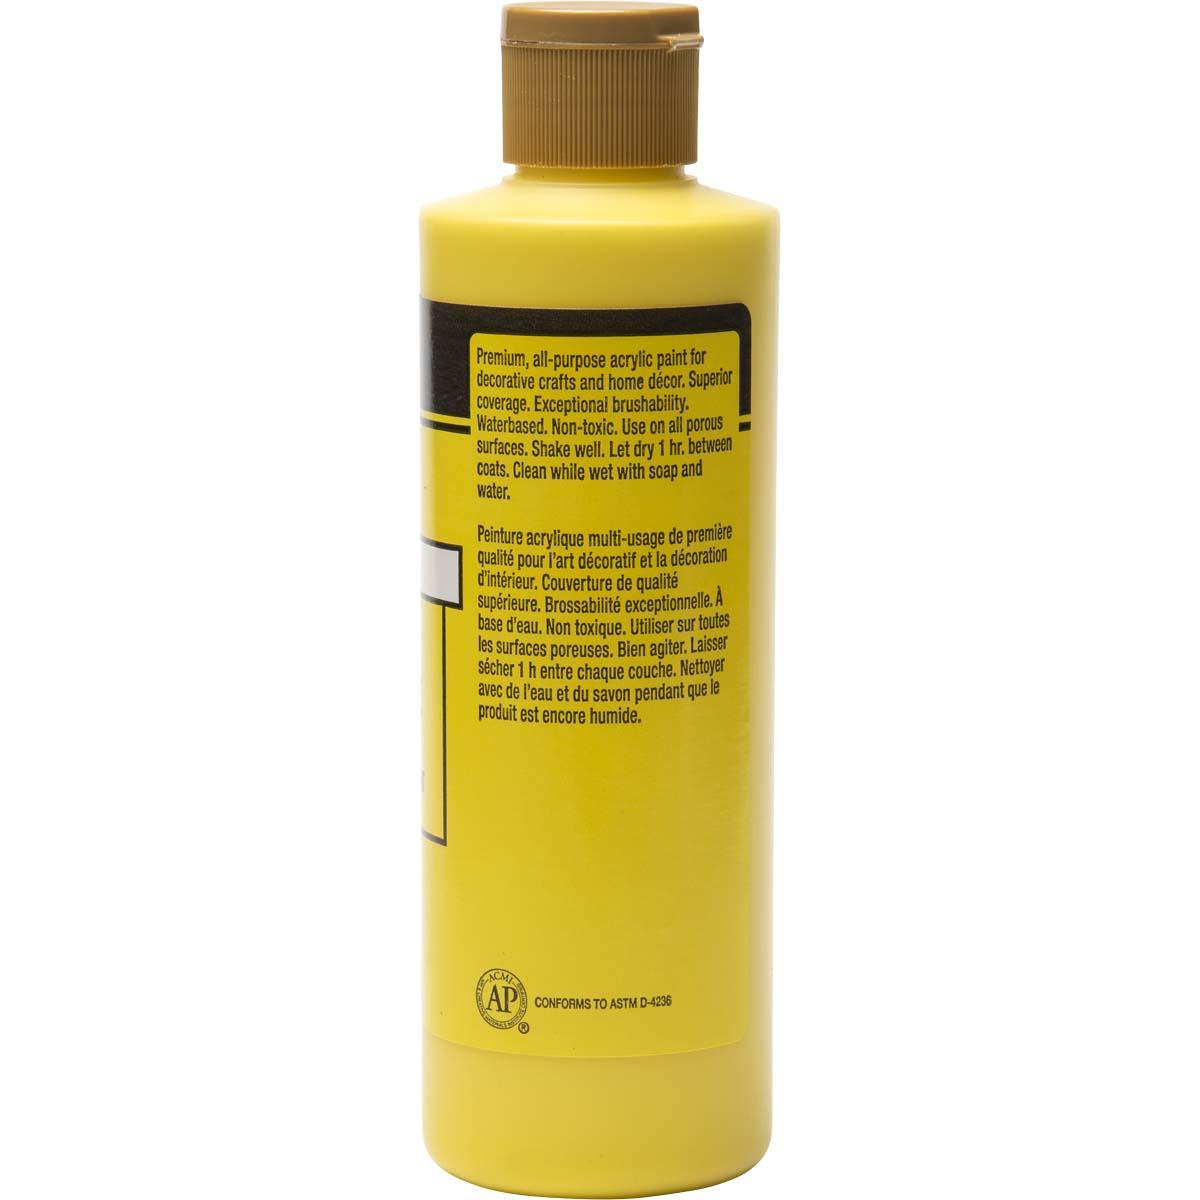 FolkArt ® Acrylic Colors - Daffodil Yellow, 8 oz. - 2326